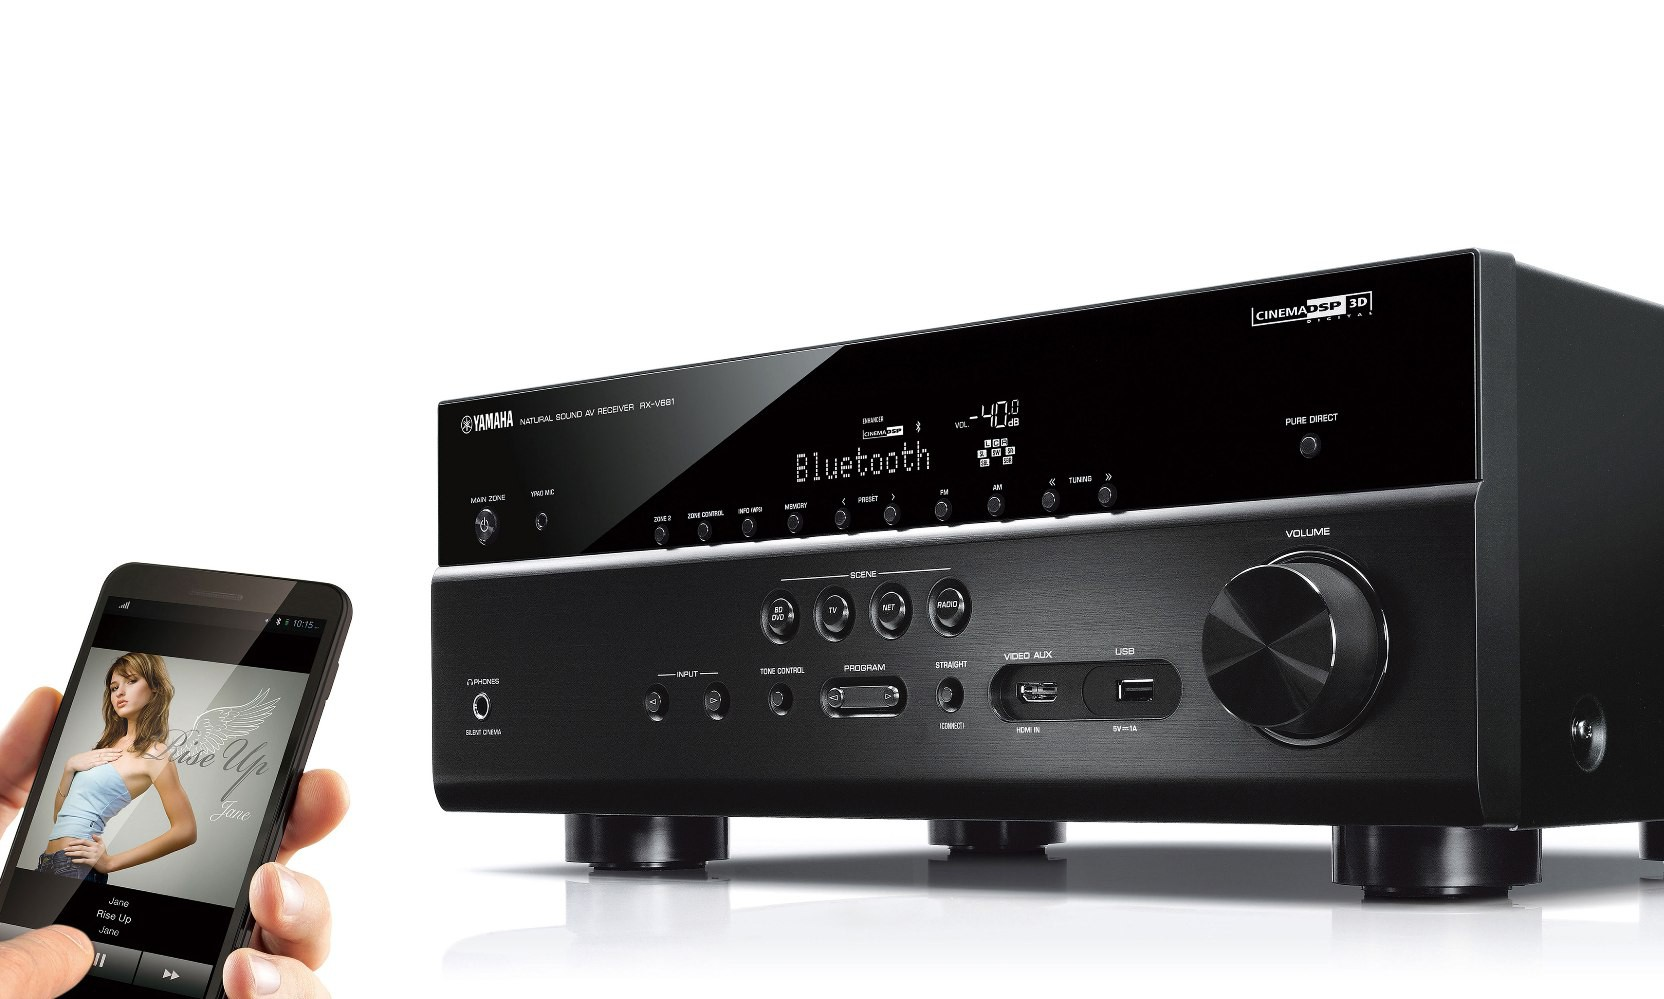 yamaha s latest line of home cinema receivers rx vx81. Black Bedroom Furniture Sets. Home Design Ideas